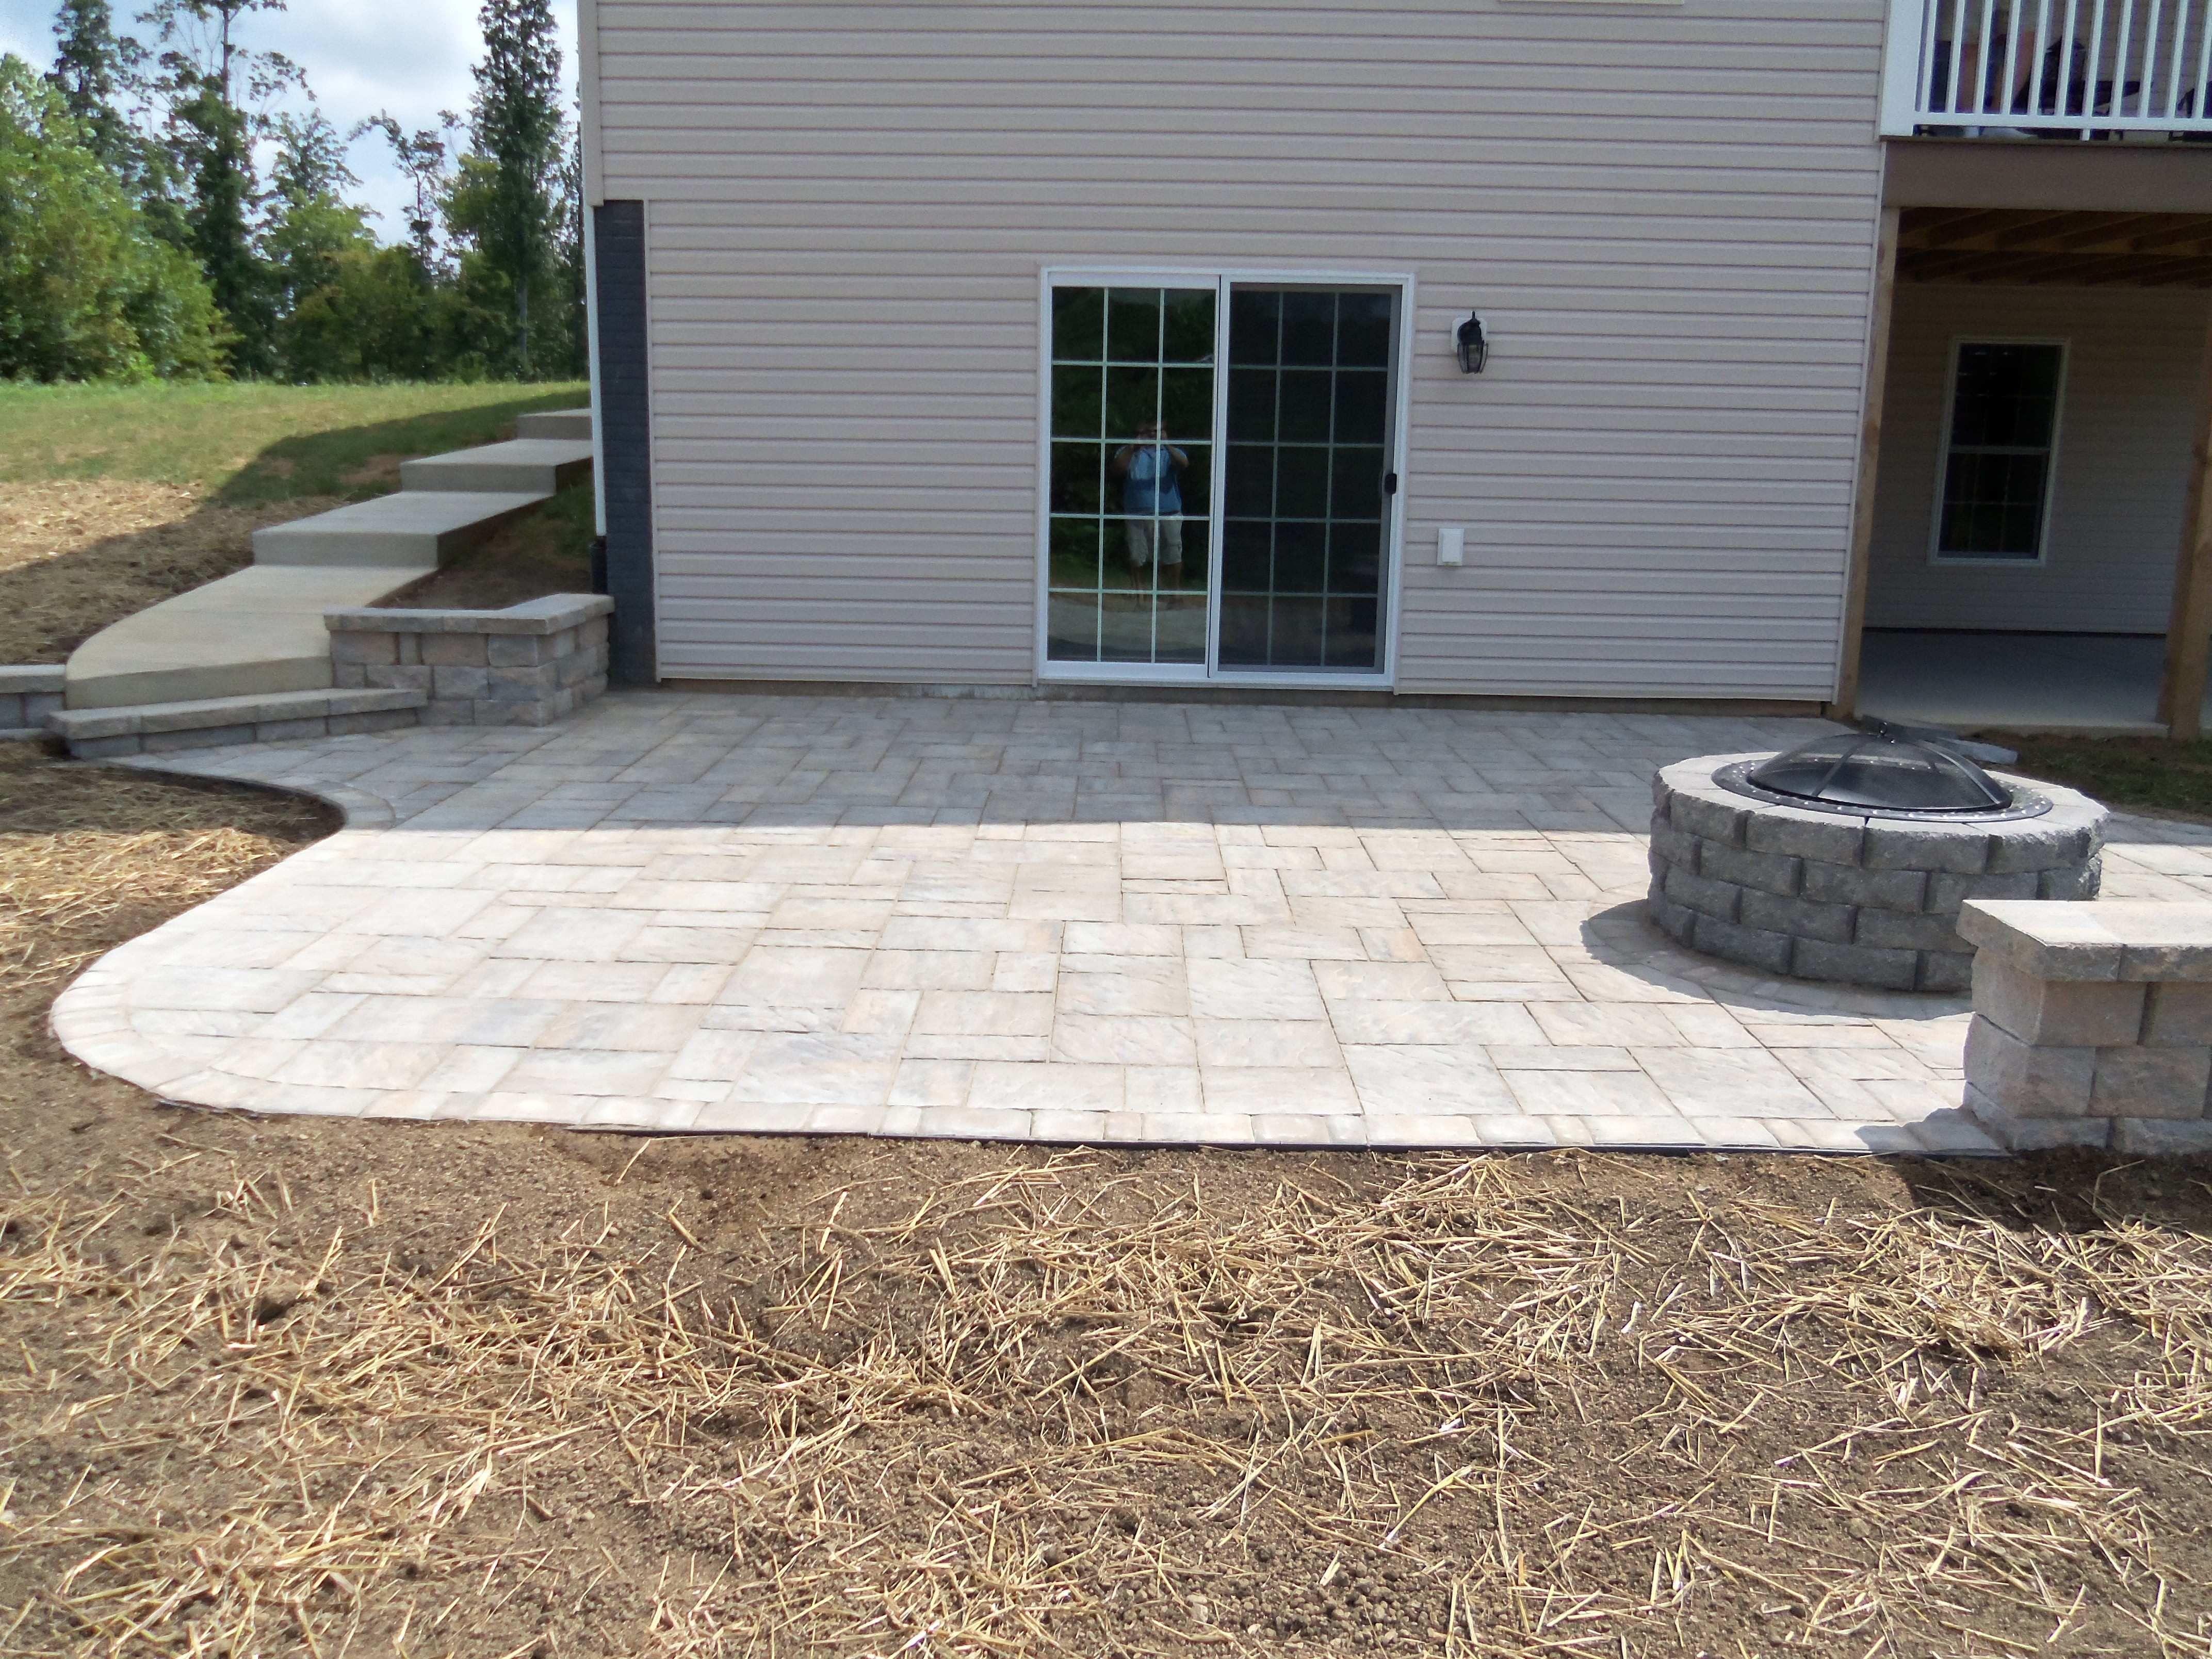 Simple Concrete Patio Design Ideas Unique Patio Paver Design Ideas Full Size Garden Ideascheap Patio Of Simple Concrete Patio Design Ideas